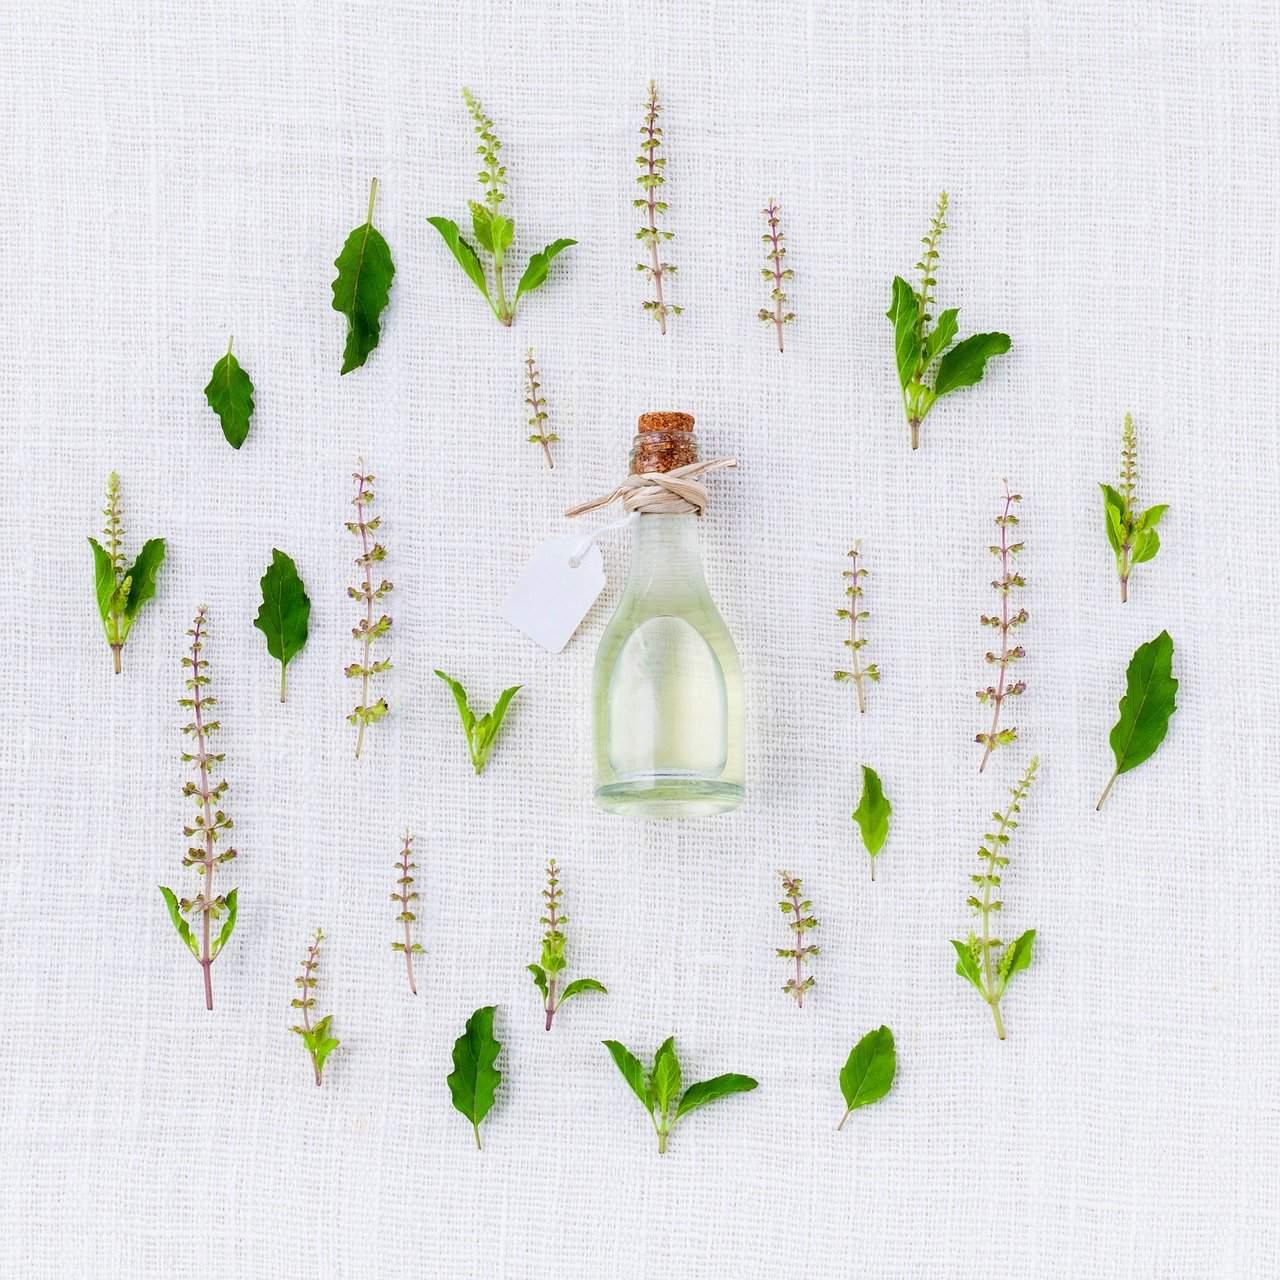 aroma, basil, spices